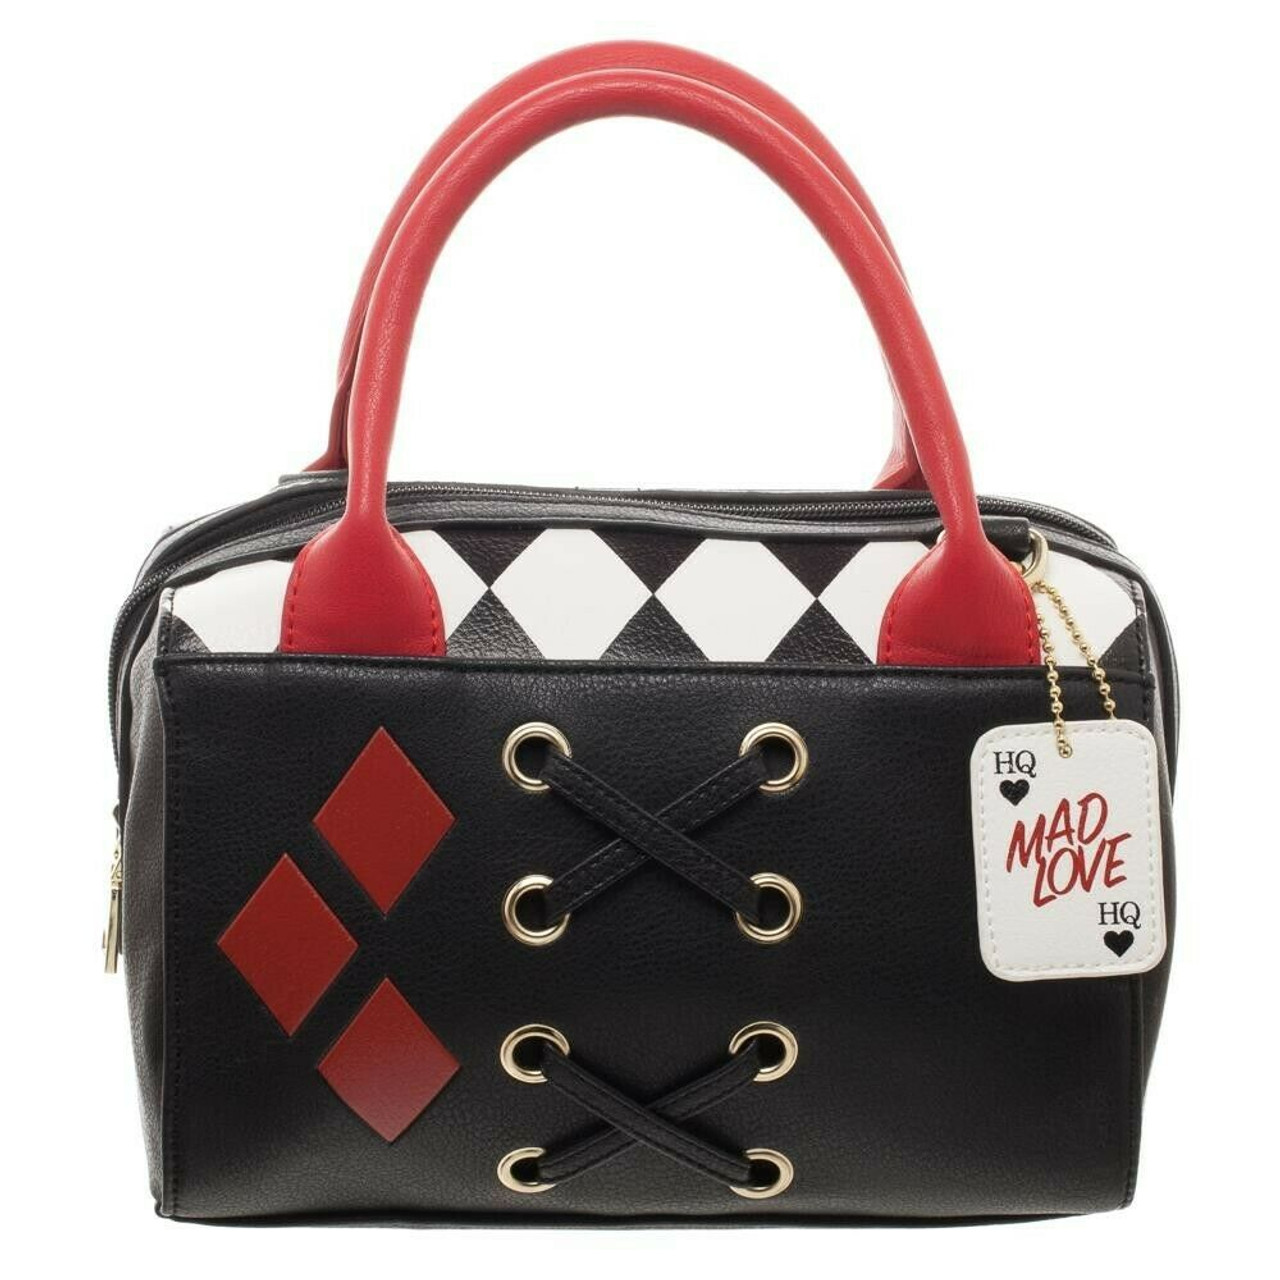 dbd2db819f Bioworld DC Comics Harley Quinn Dottie Mad Love Mini Satchel Handbag  LB5NCXBTM - Fearless Apparel